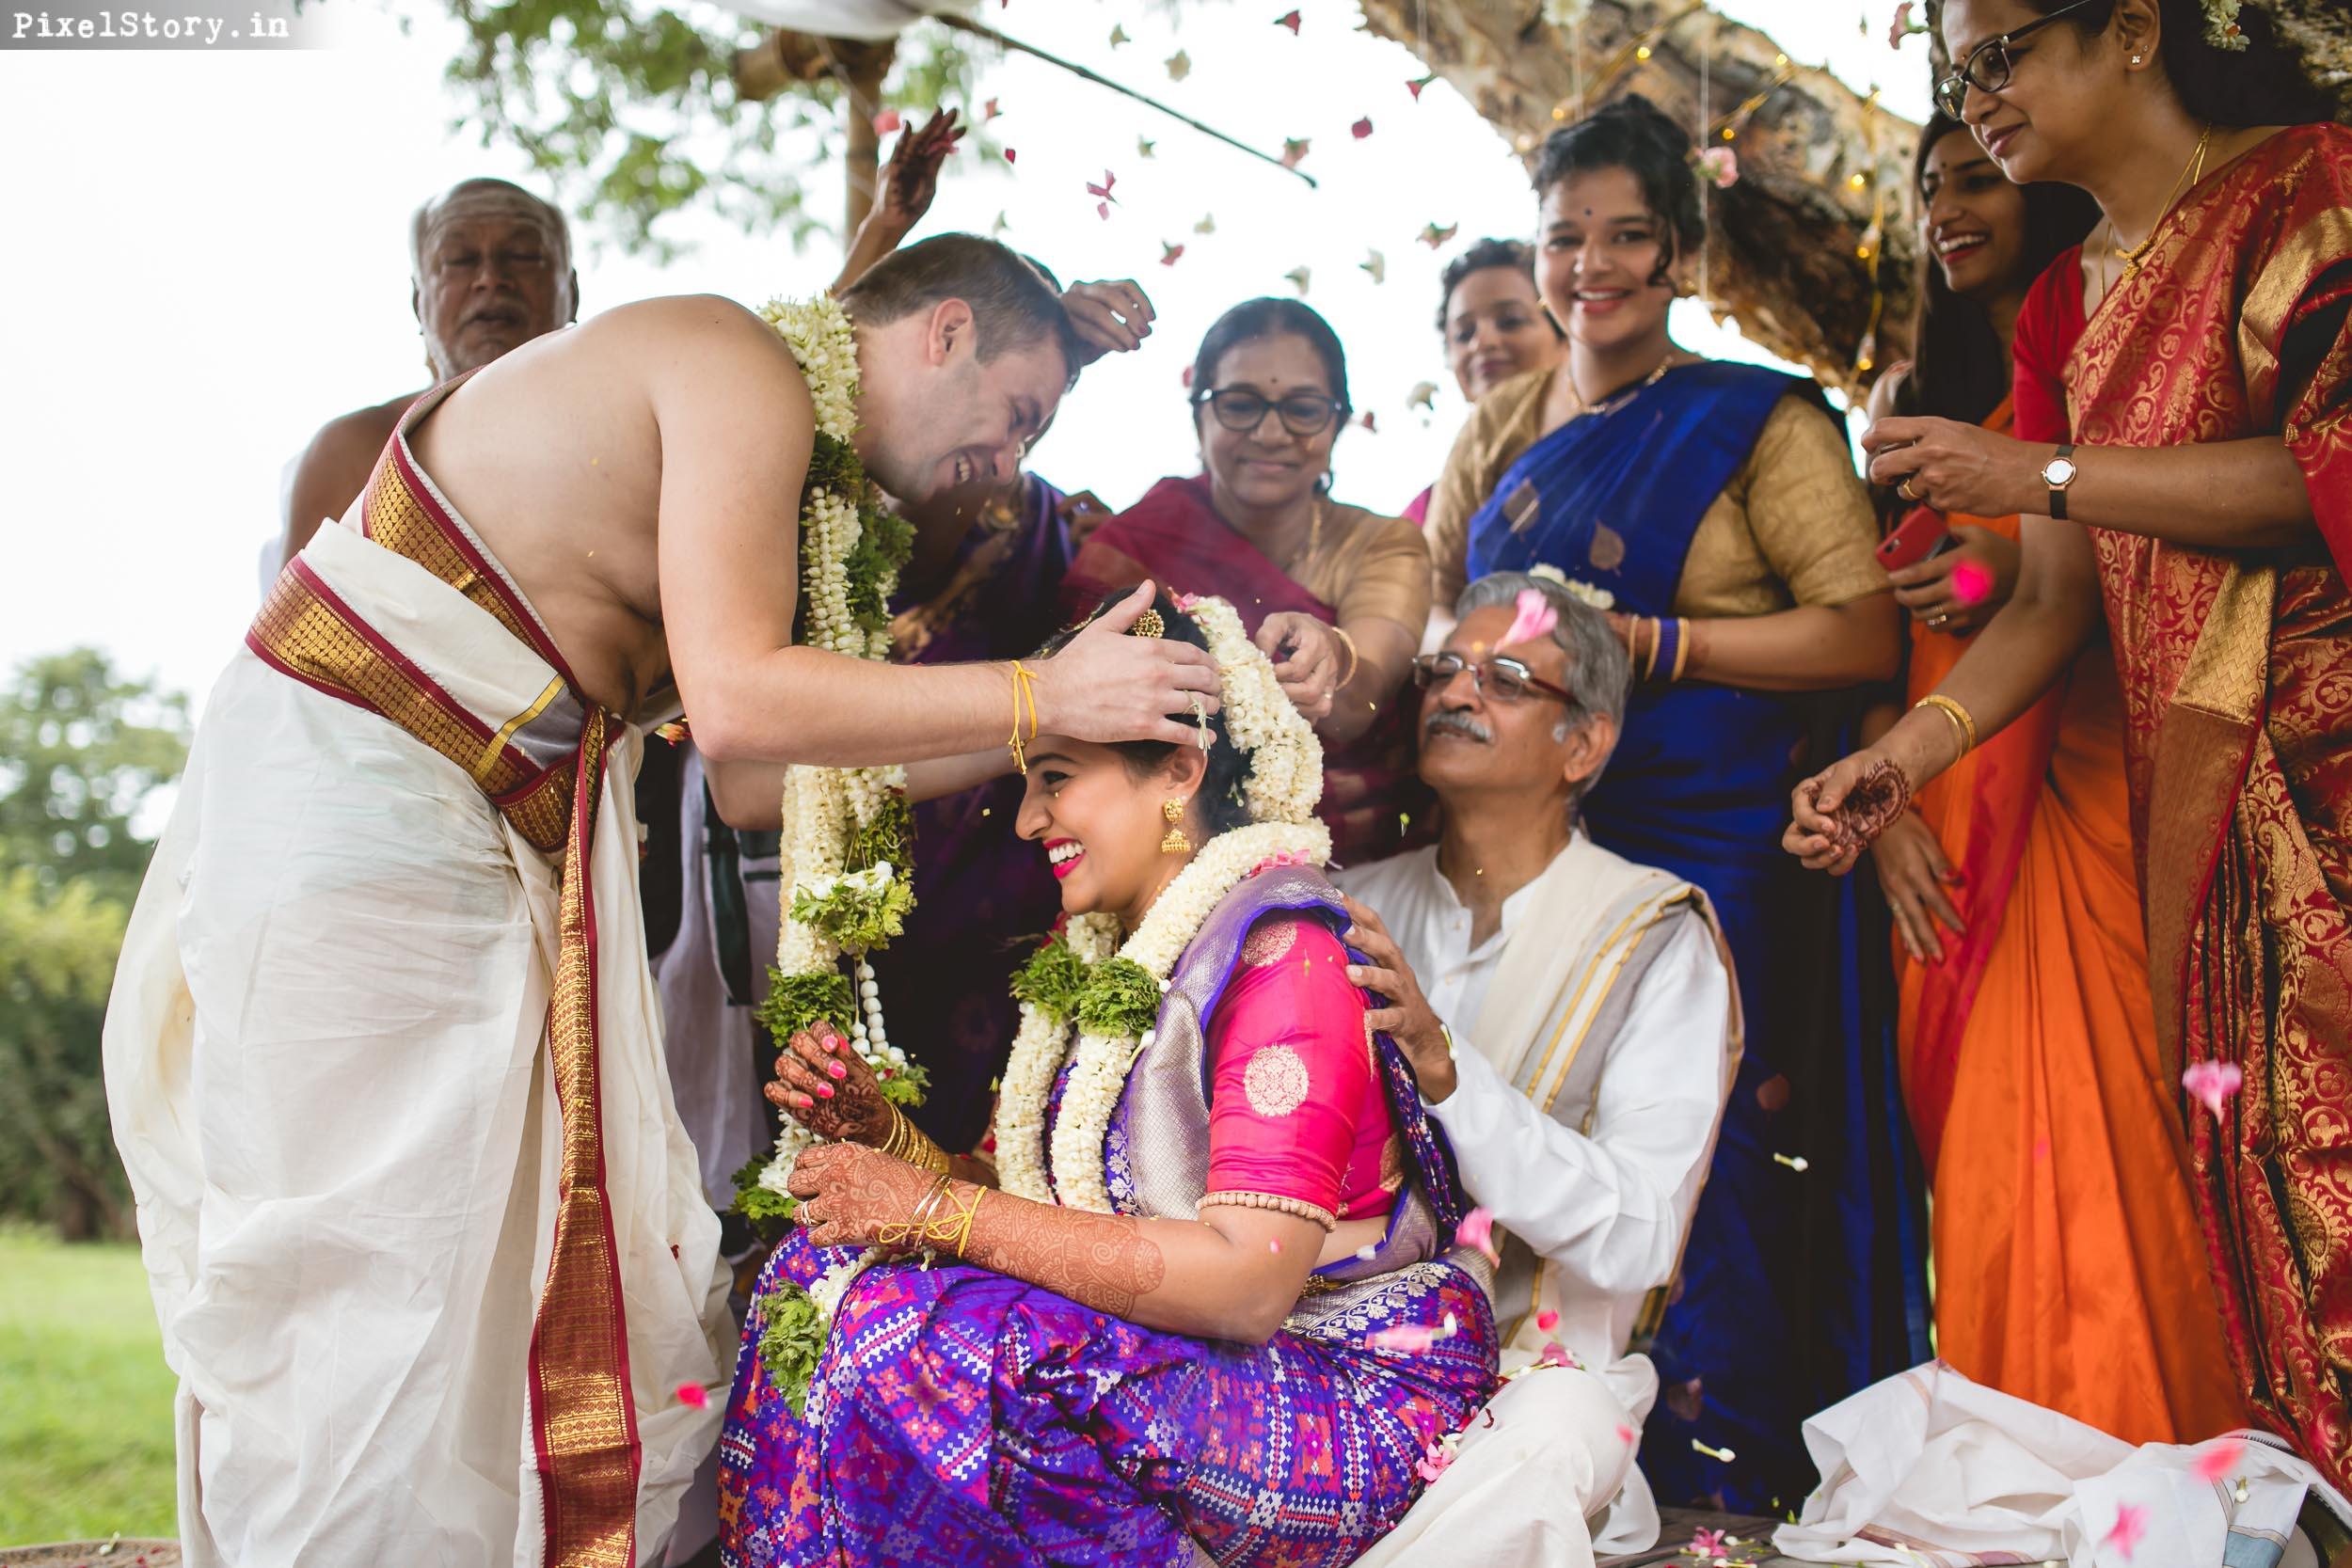 PixelStory-Jungle-Wedding-Photographer-Masinagudi-Indo-French065.jpg